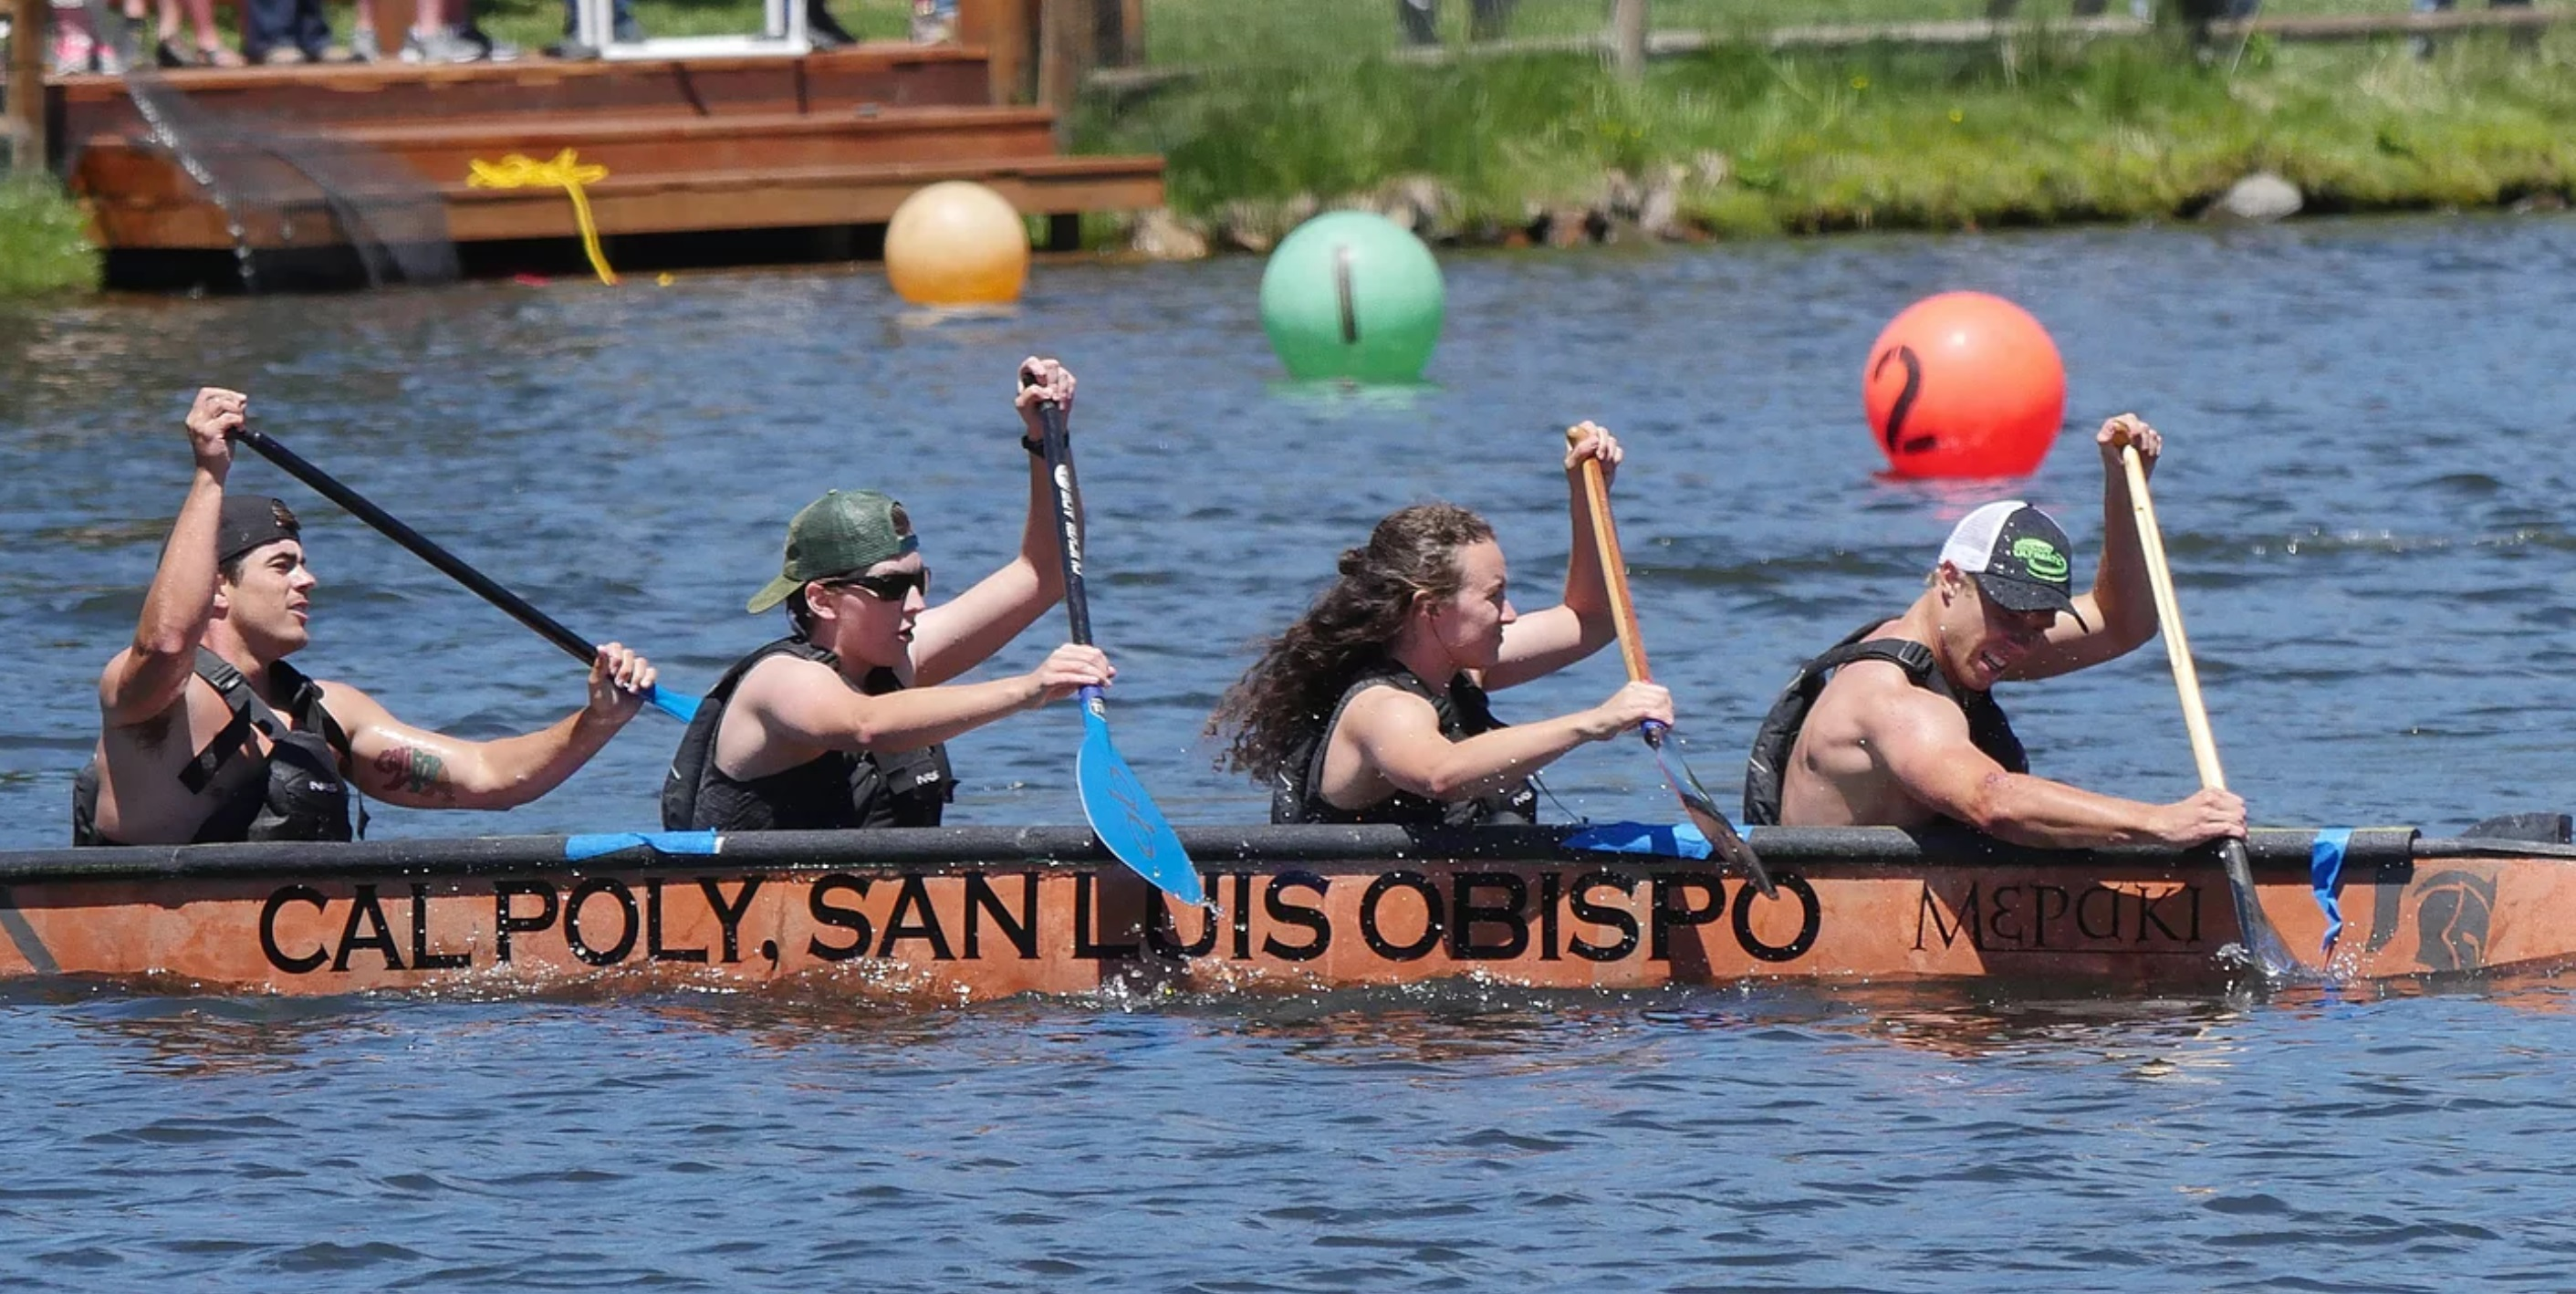 Concrete canoe team paddling